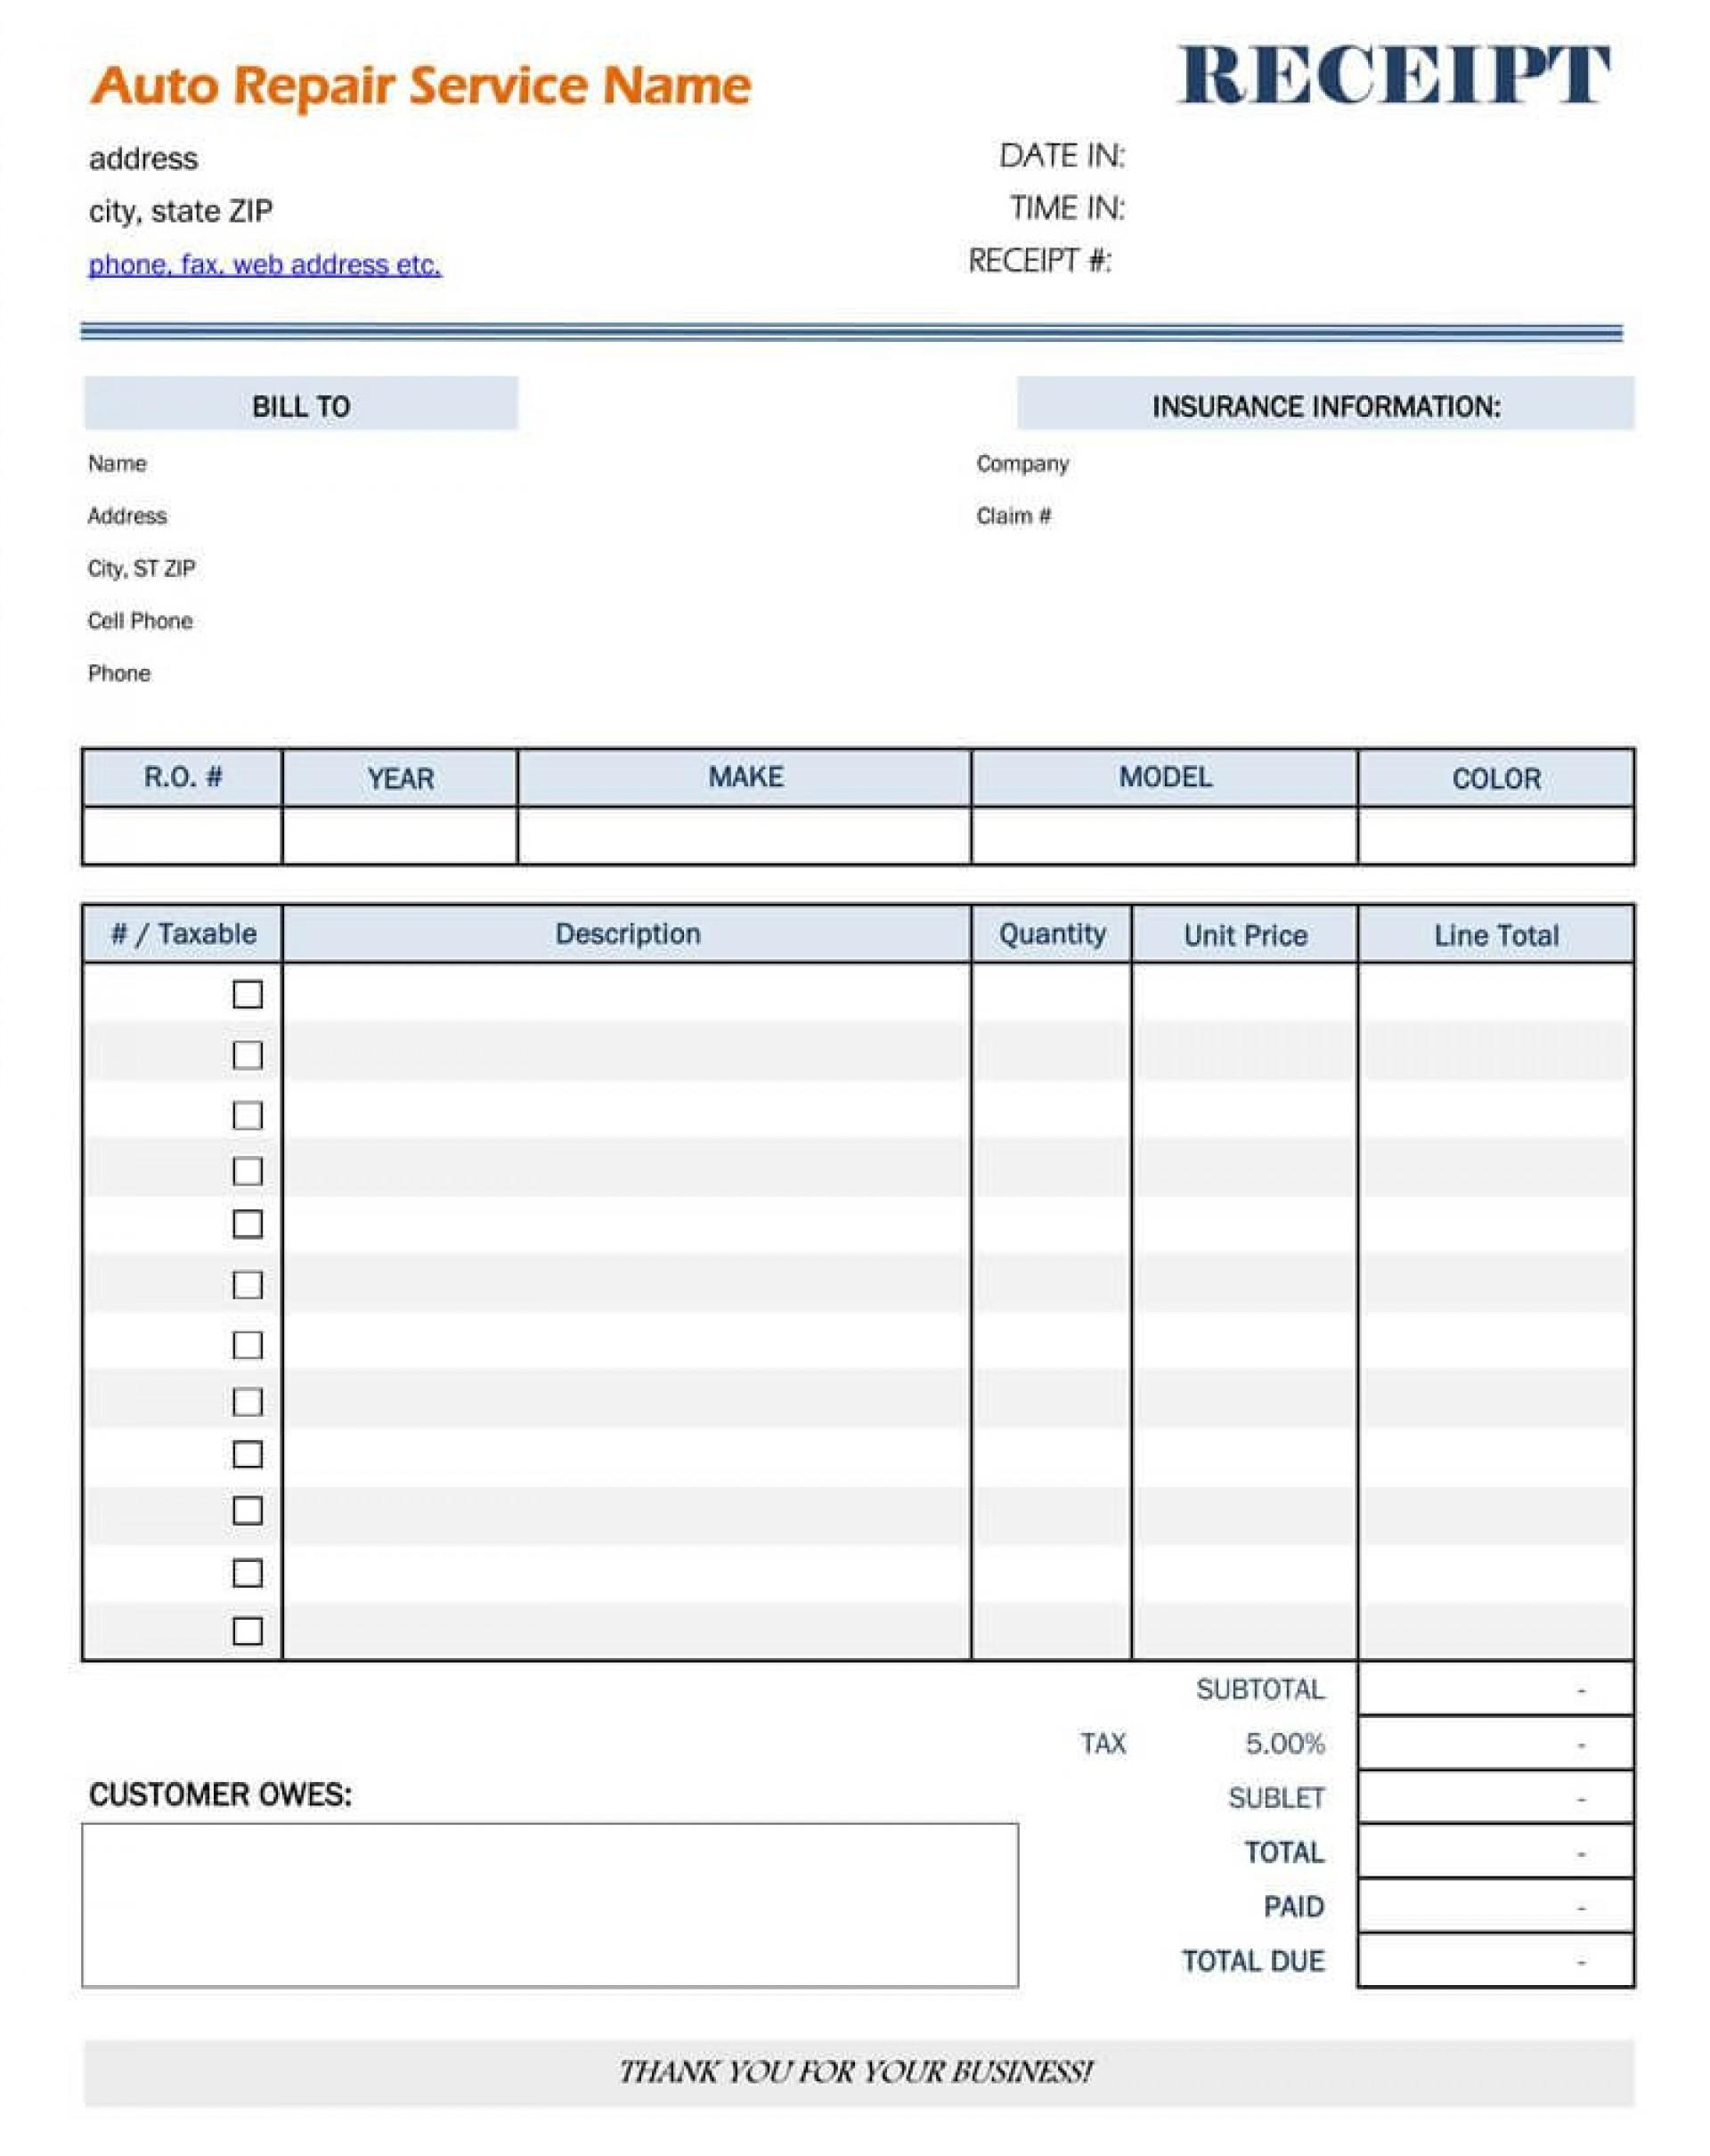 001 Wonderful Auto Repair Invoice Template Pdf Highest Quality  Free Form Receipt1920